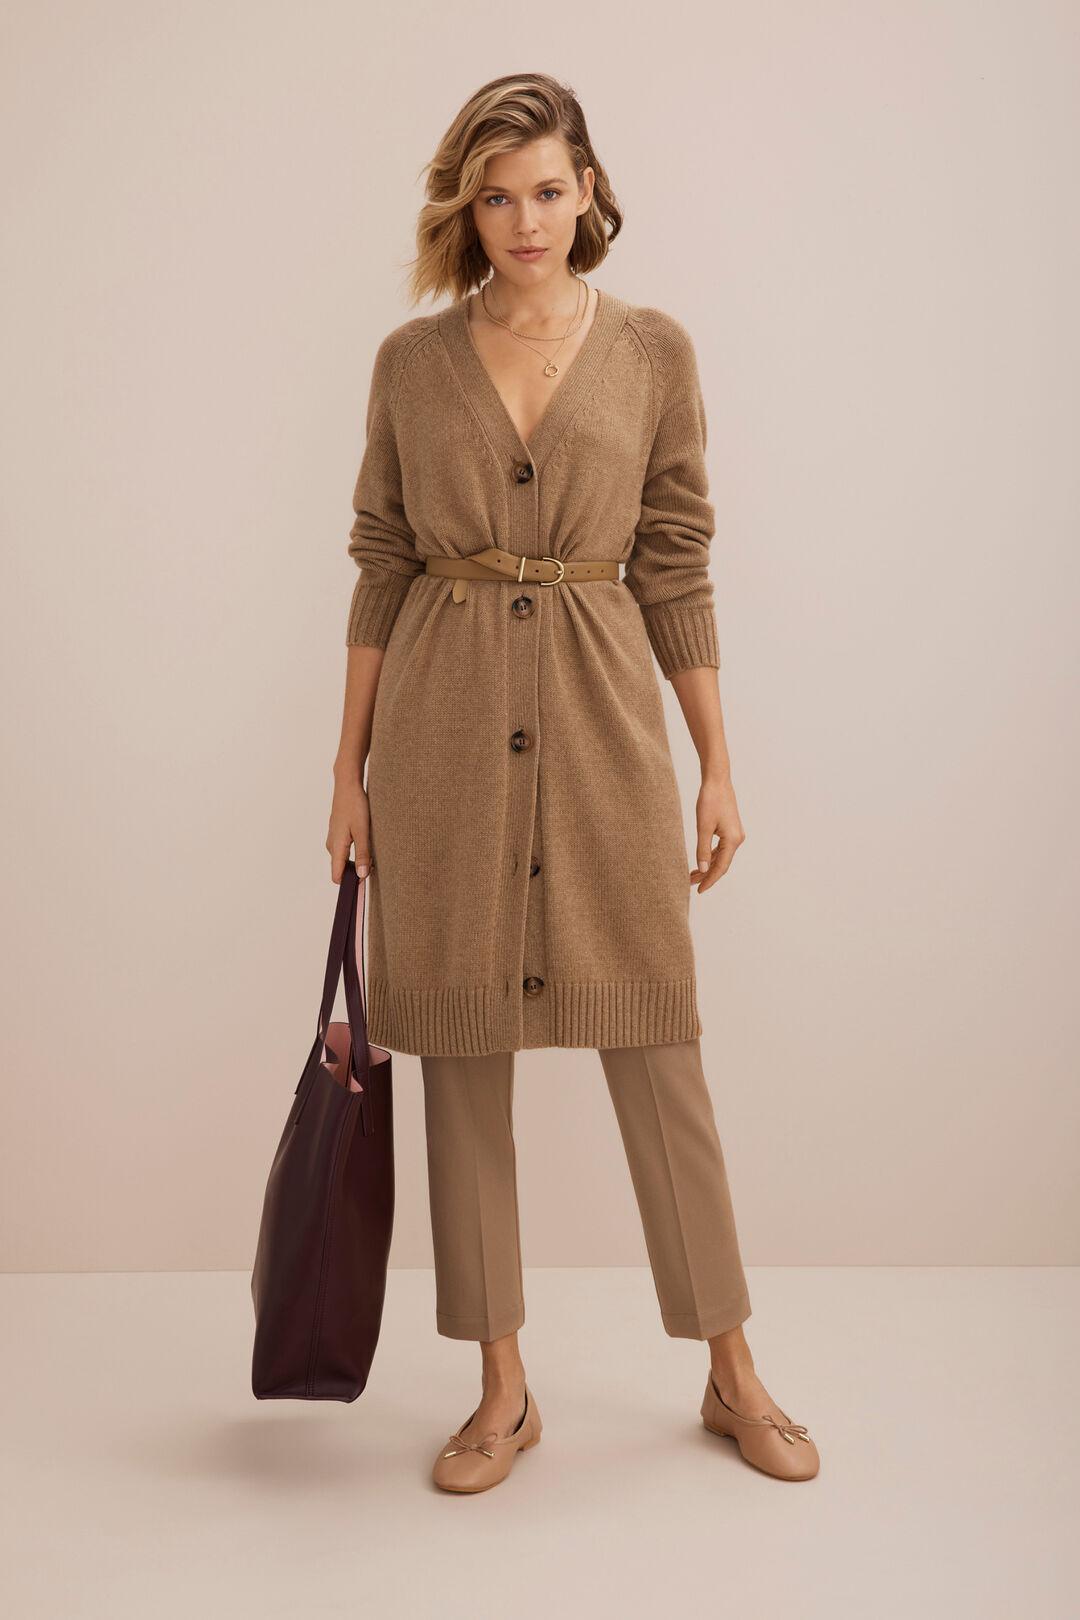 Wool Blend Cardigan   HONEY DEW MARLE  hi-res